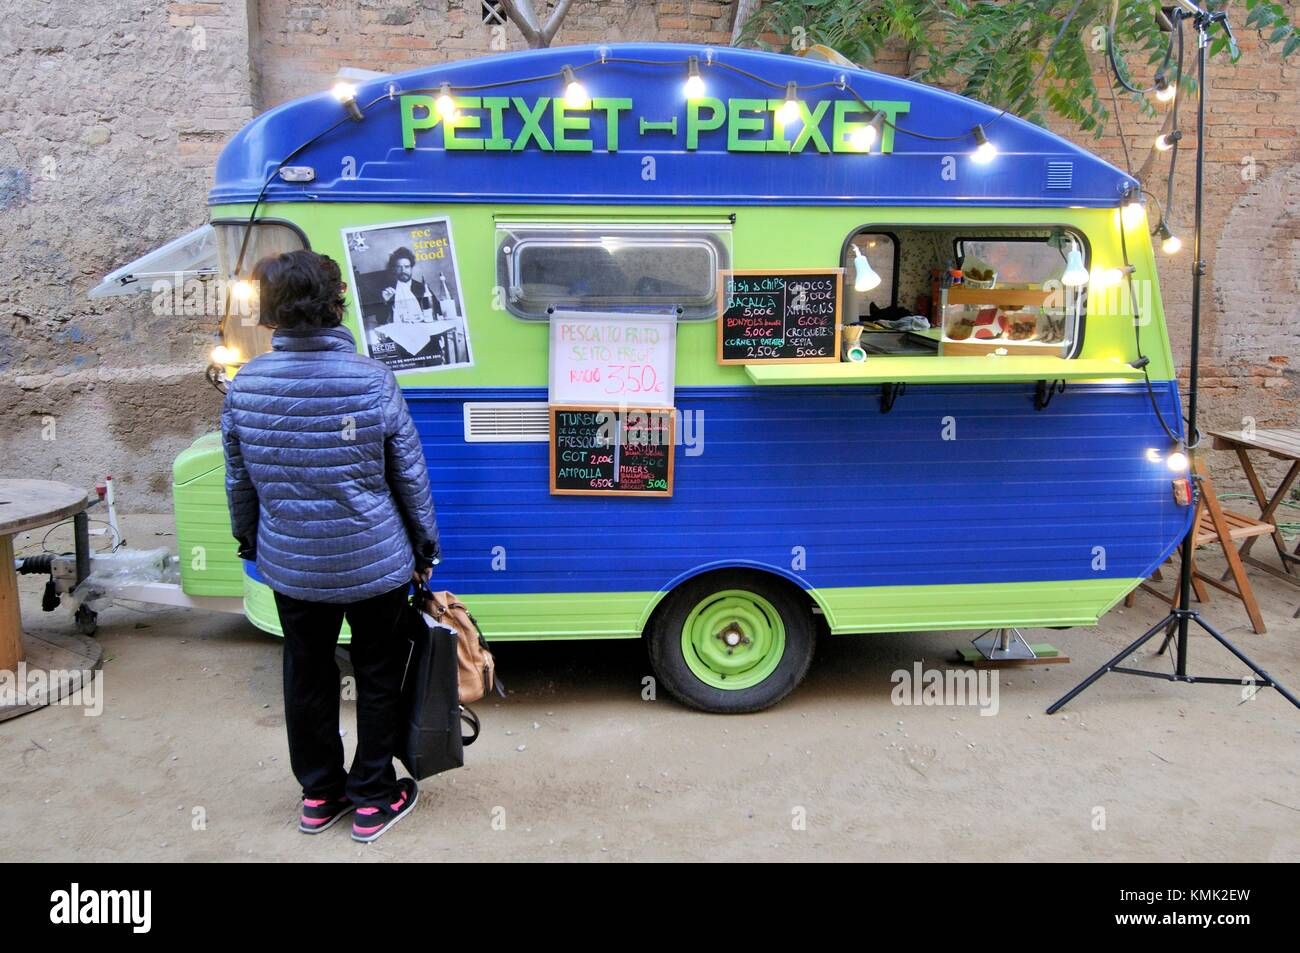 Food truck, Festival Rec.0, Experimental Stores. Igualada, capital de la Anoia comarca of Barcelona, Catalonia, - Stock Image